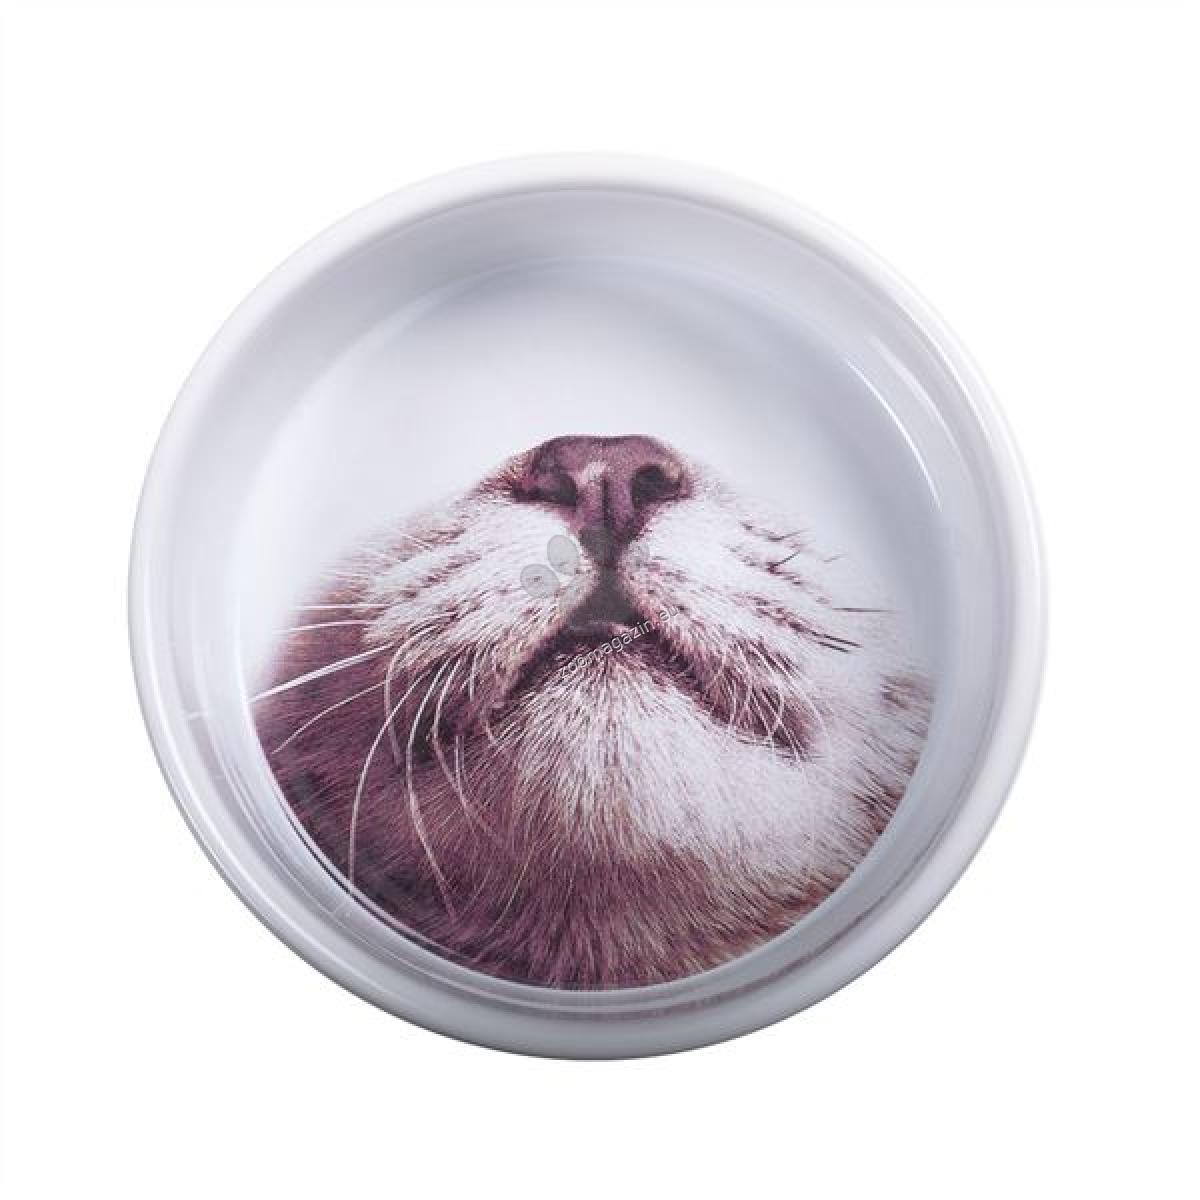 Pet Brands MOP Ceramic Cat Feeding Bowl - керамична купа котешка муцунка 12 / 5 см.